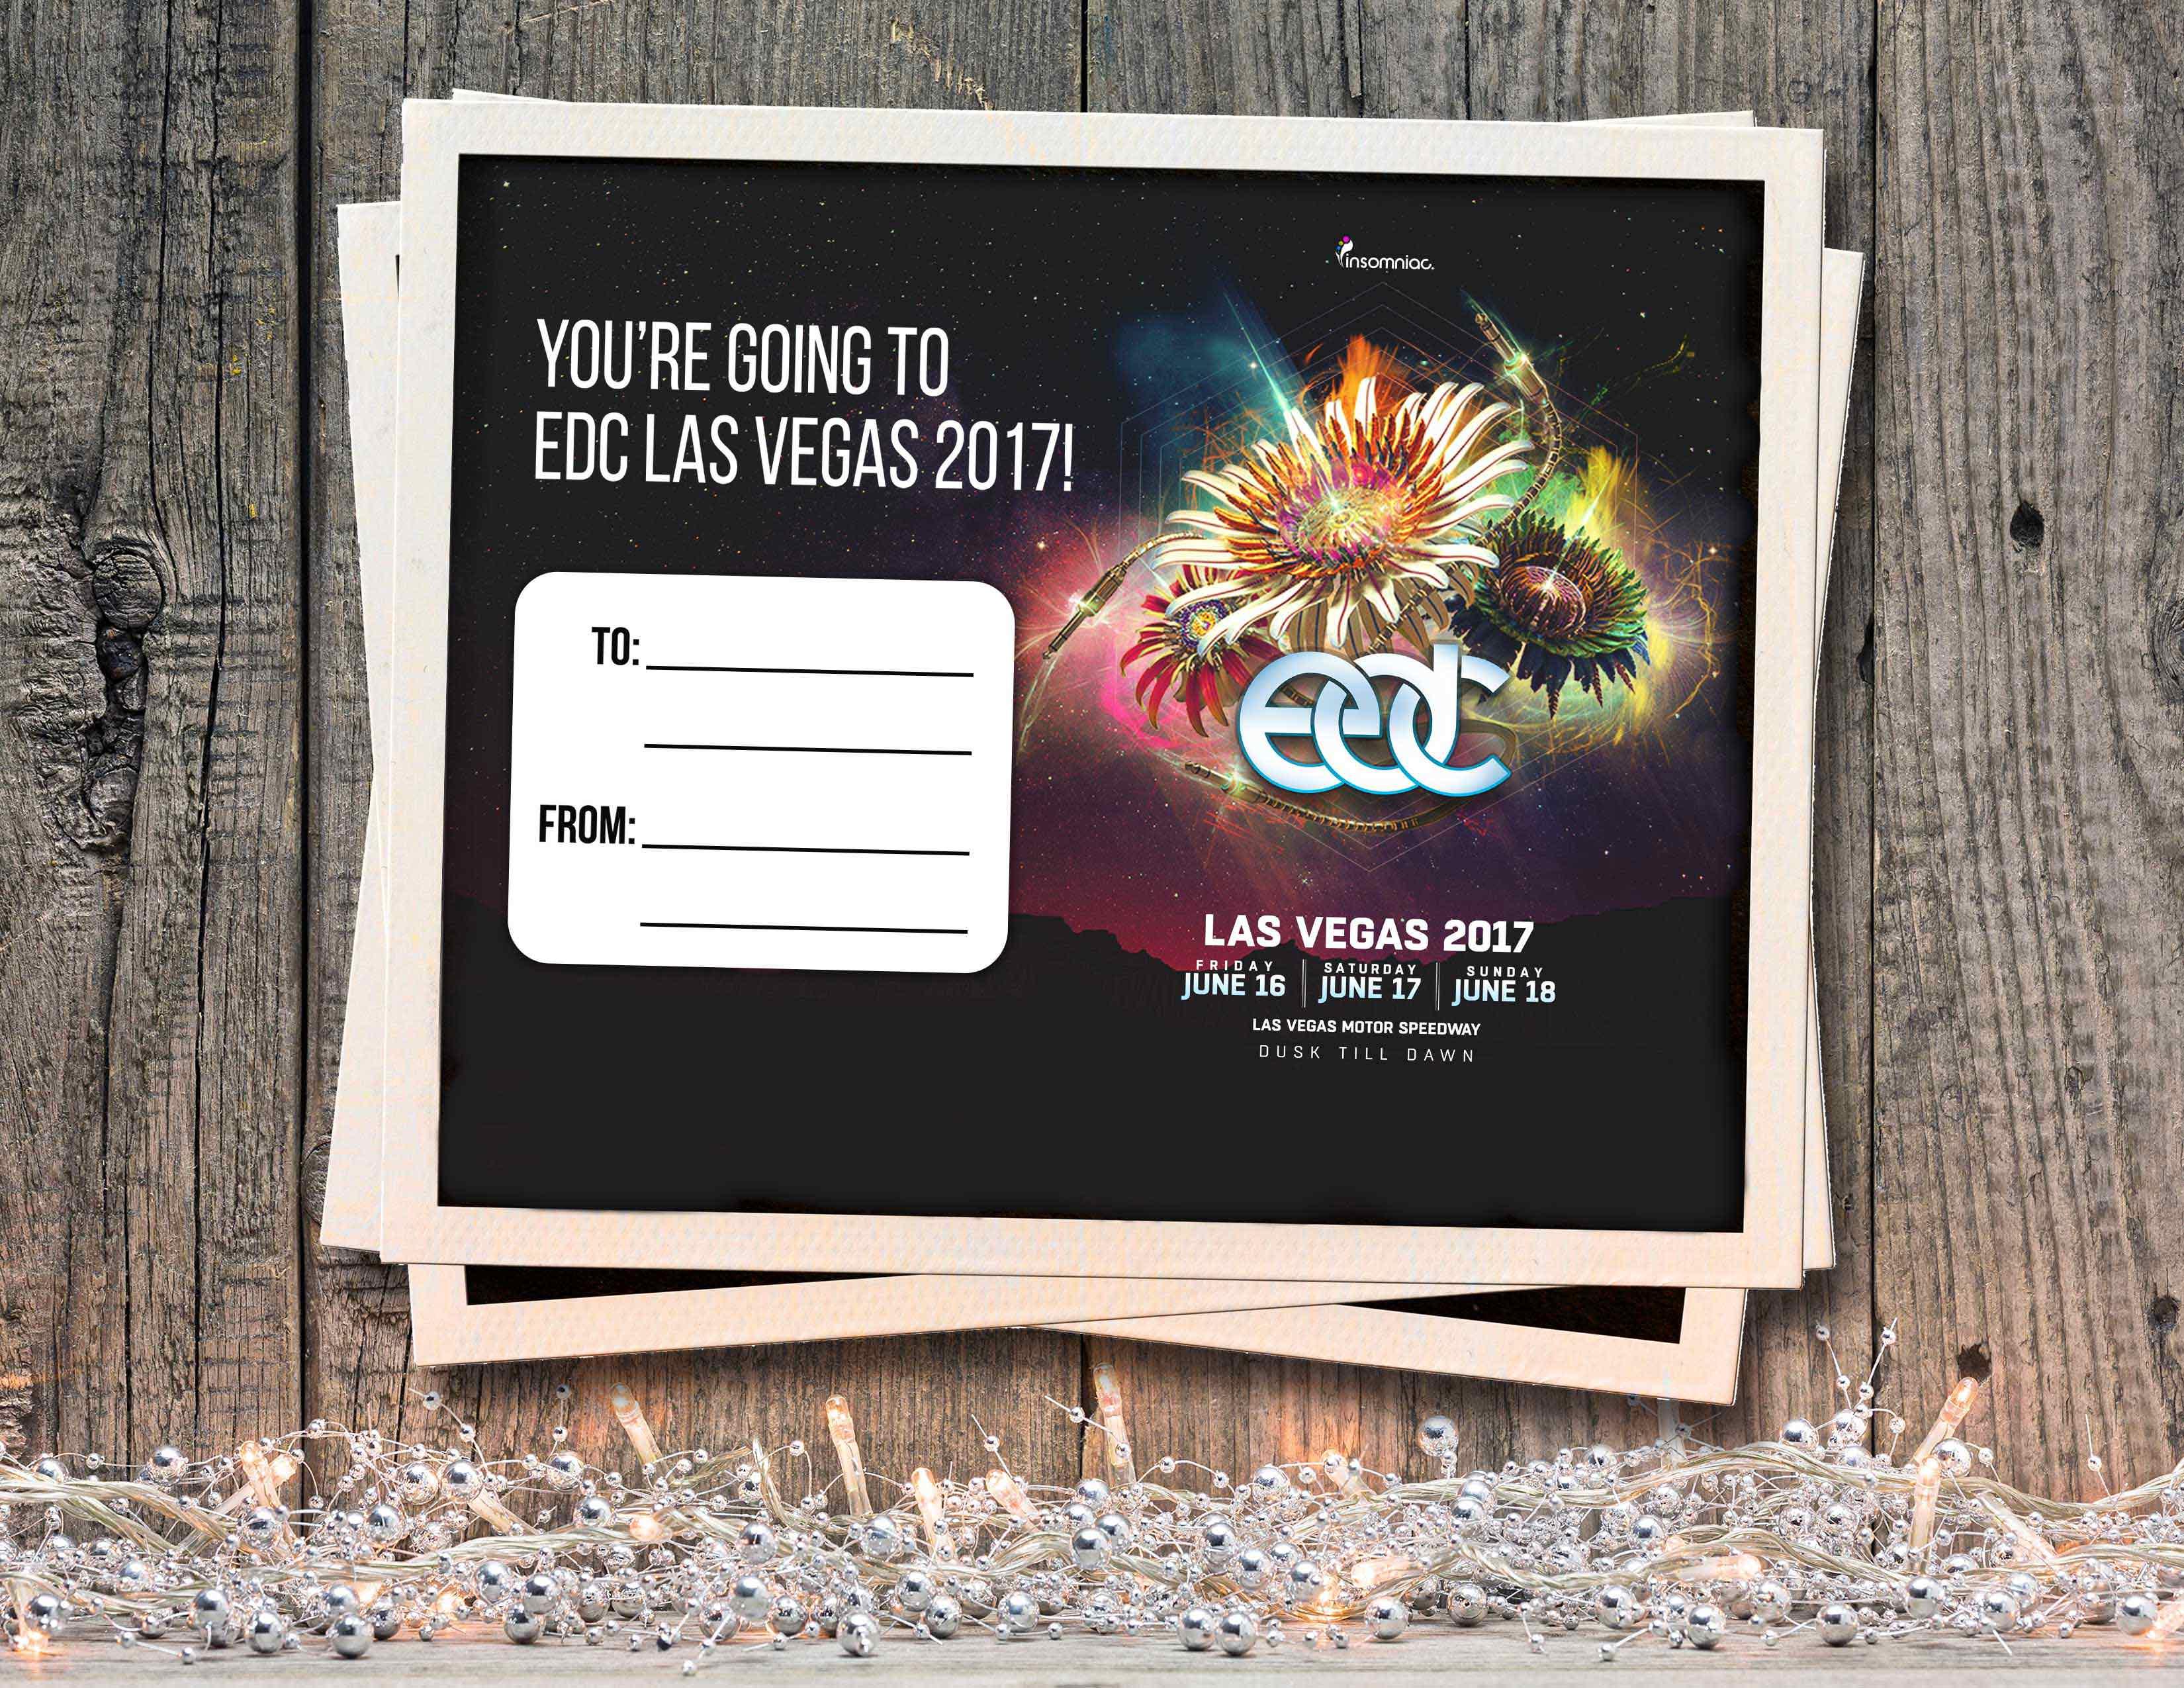 edc_las_vegas_holiday_show_certificate_8.5x11_r02_v2_WEB